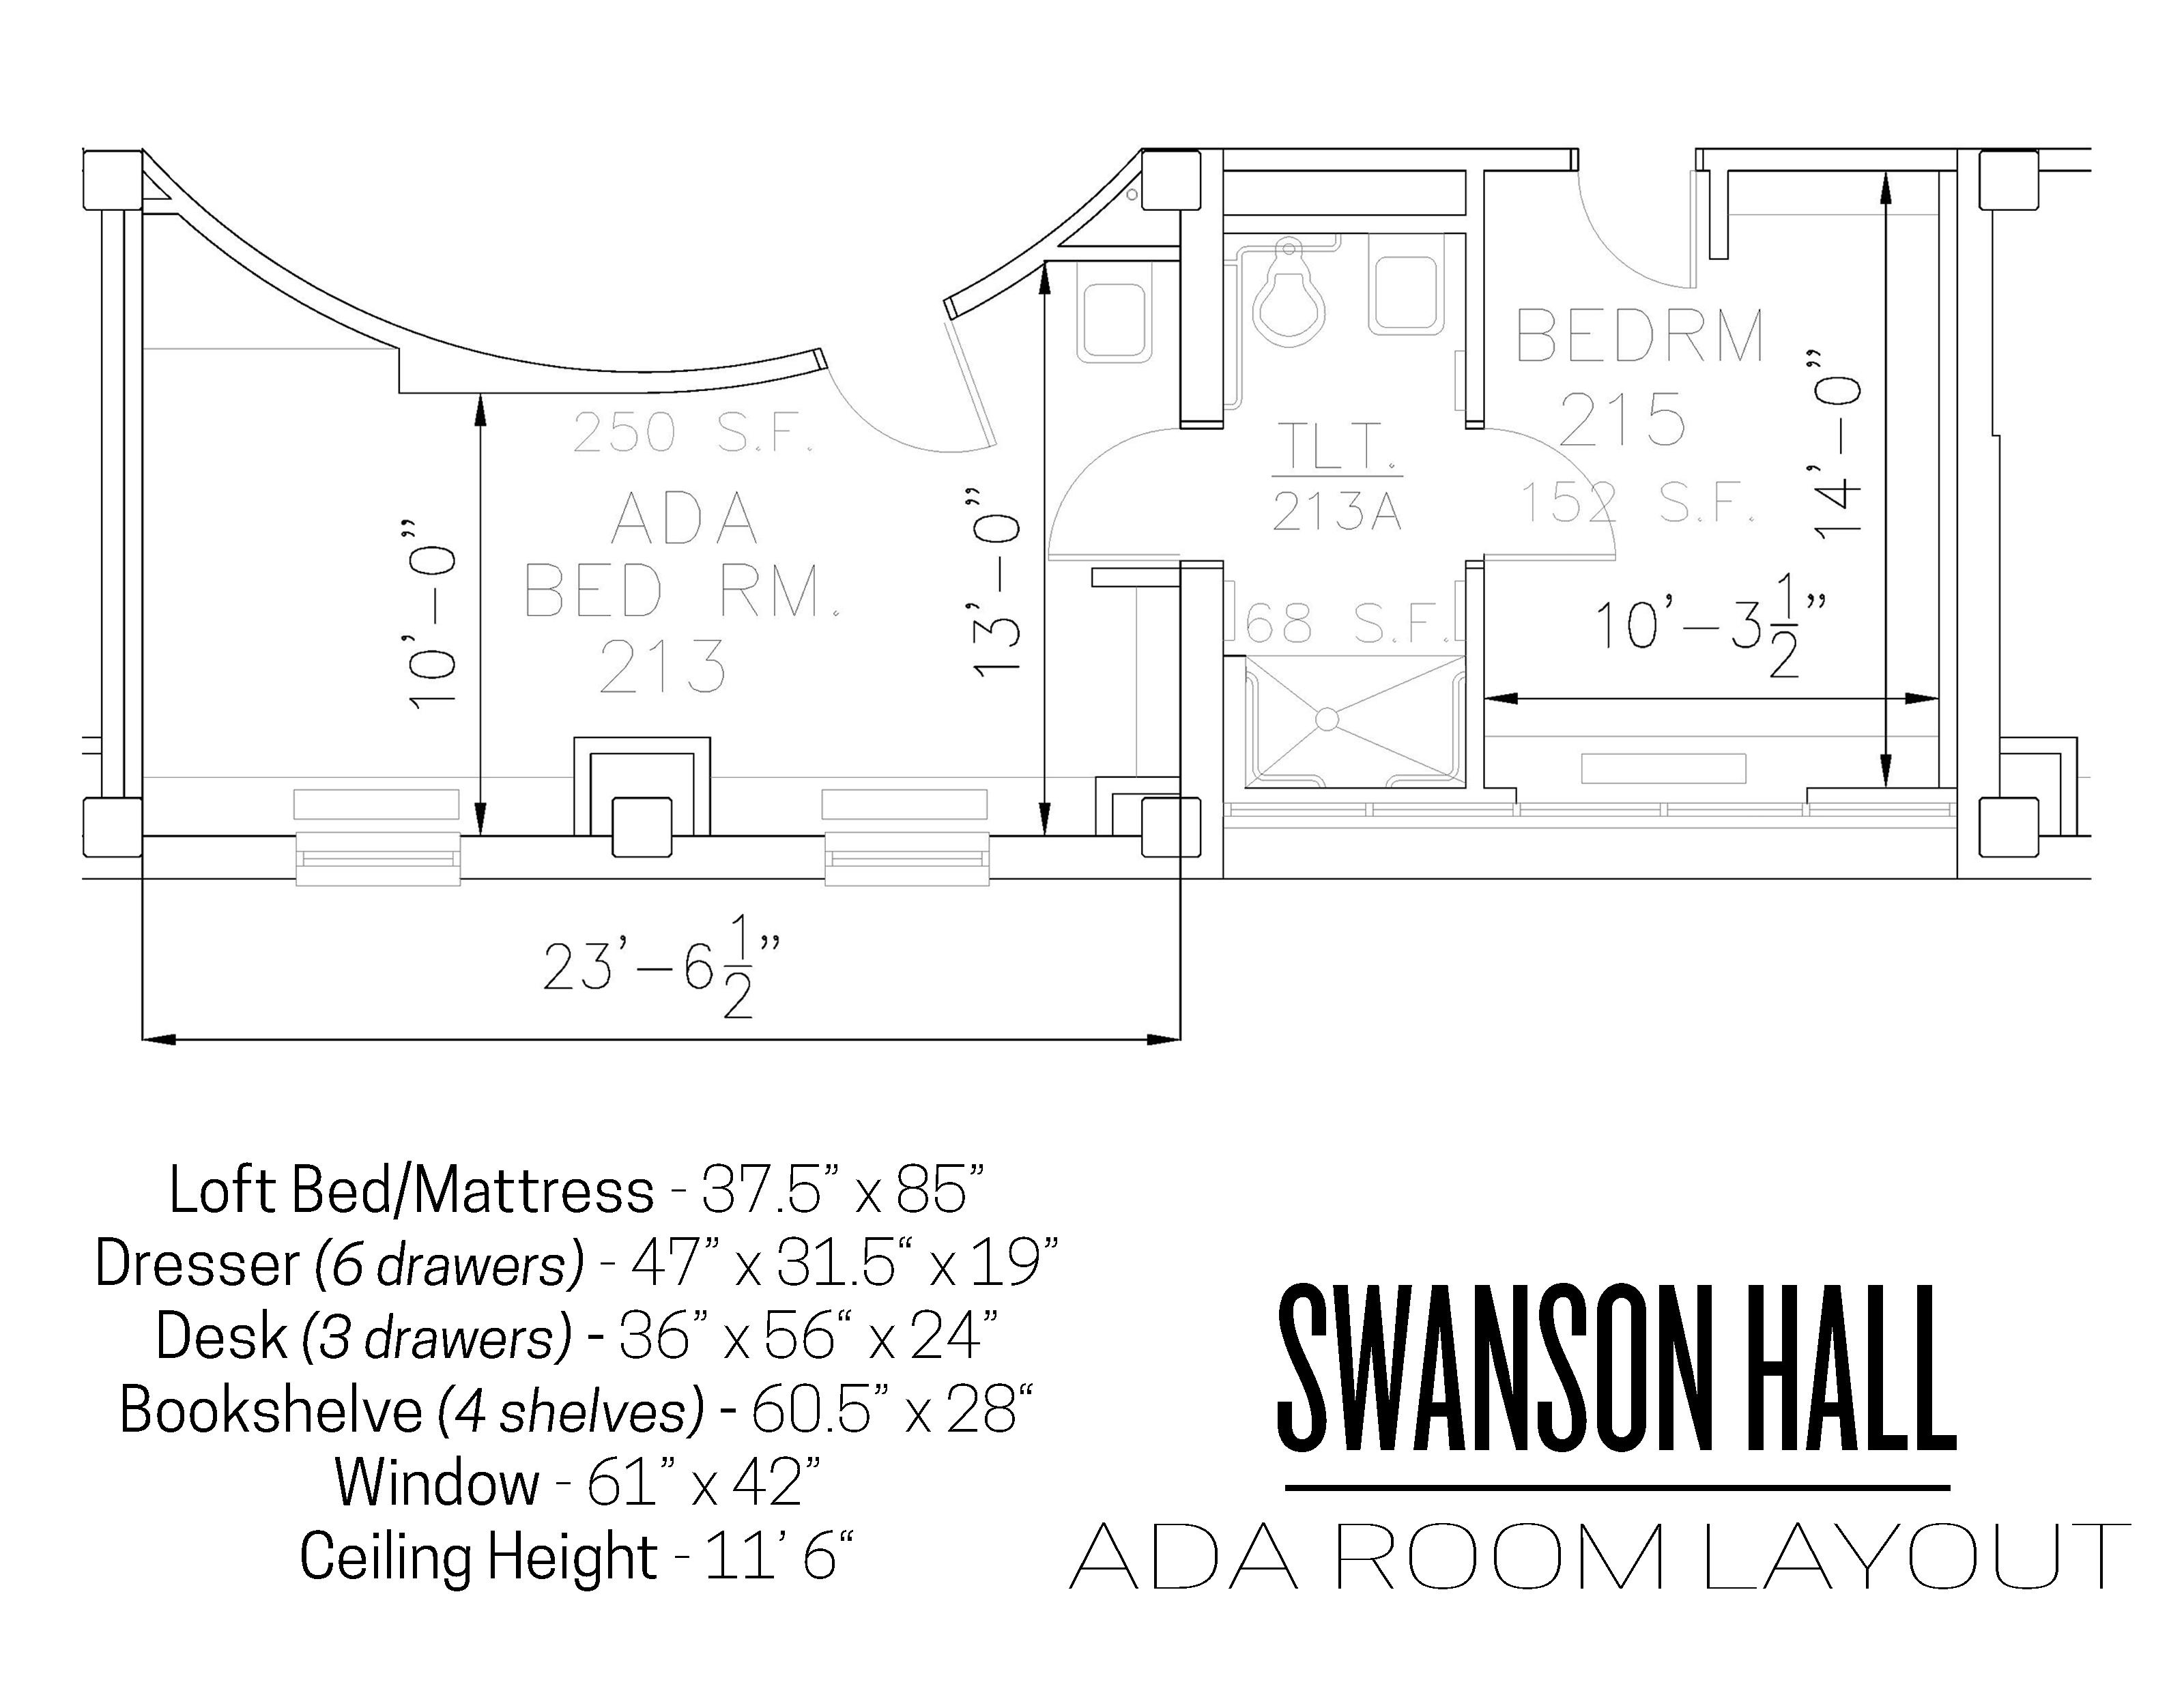 Swanson ADA